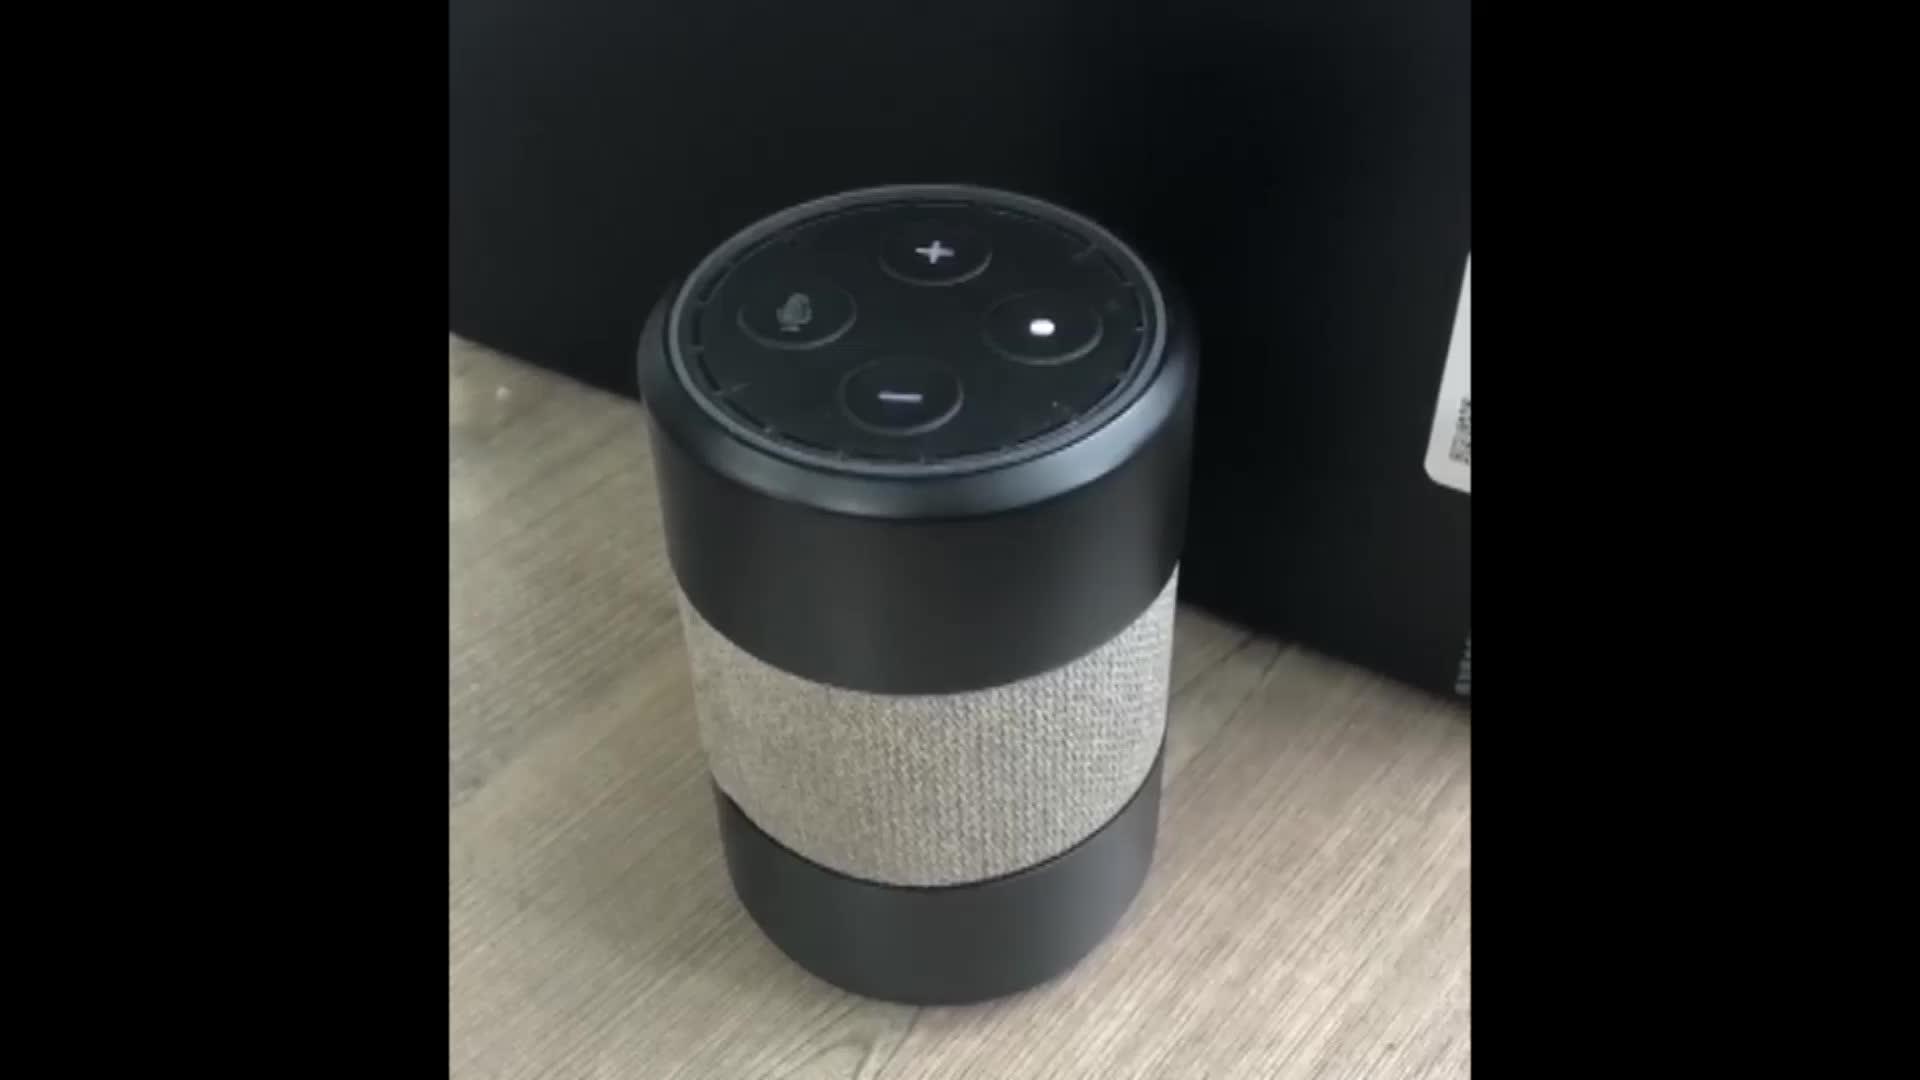 Altavoz inteligente alexa inalámbrico con subwoofer para exteriores, portátil, WiFi, AI, impermeable, con control de voz, estilo Eson